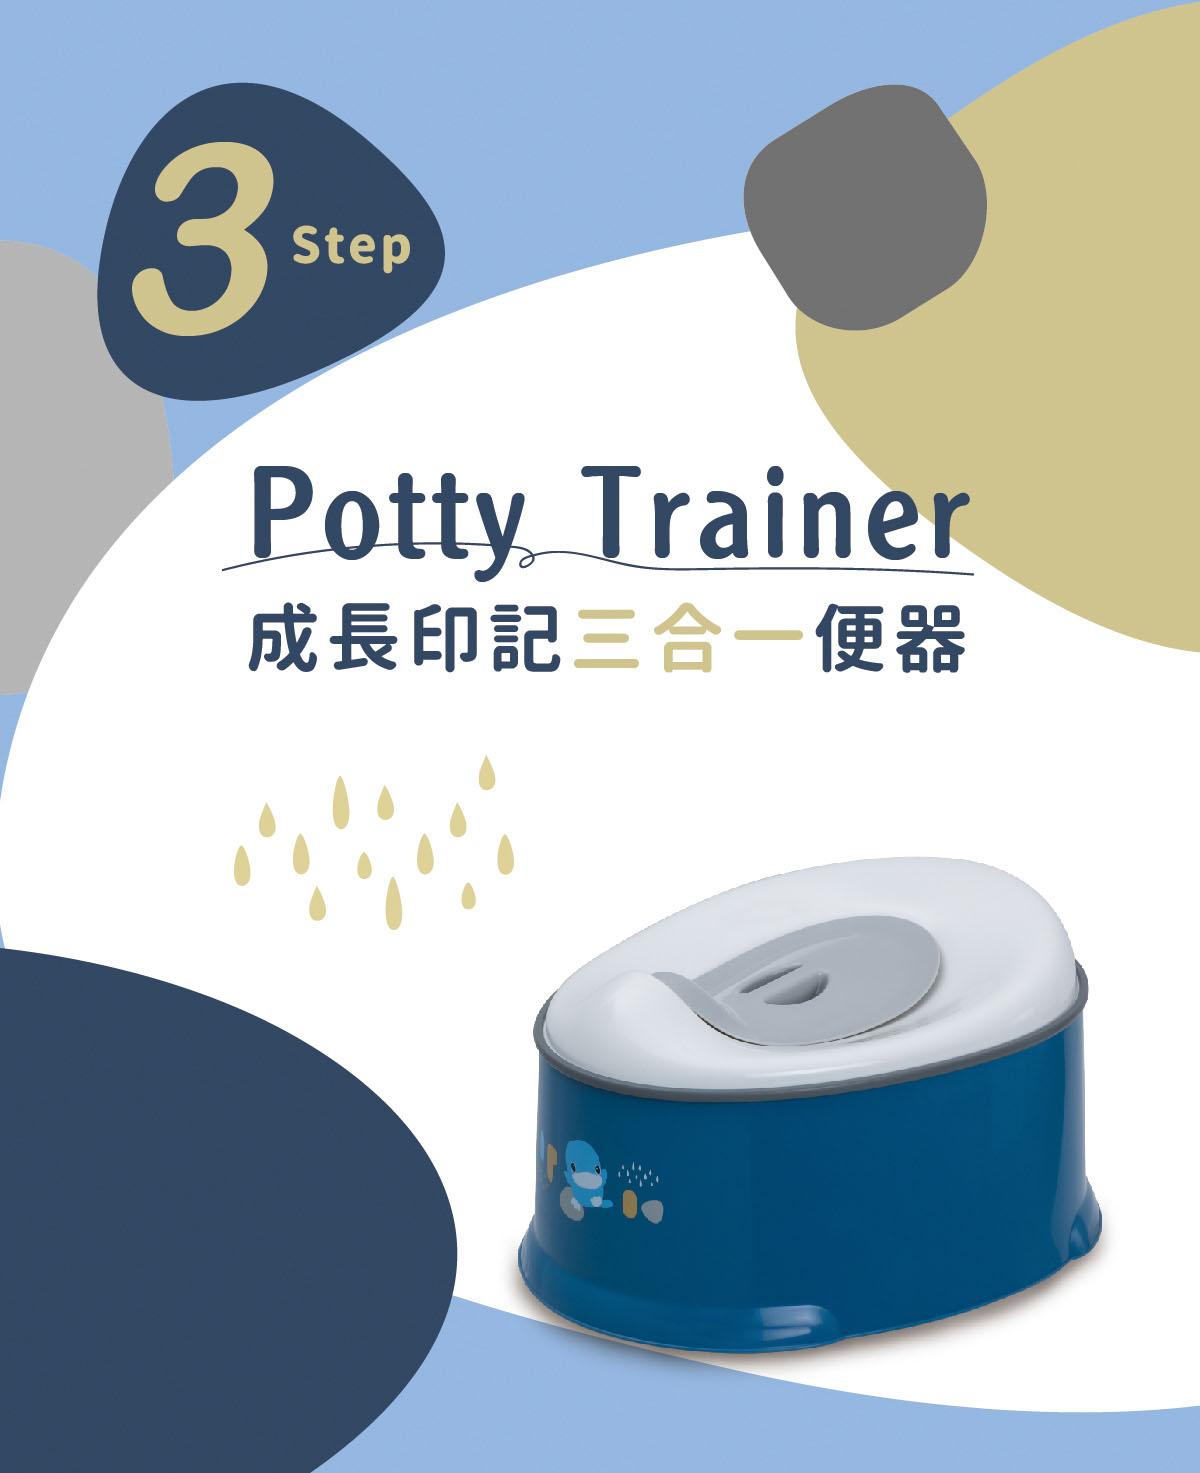 proimages/Bathing&CleanSeries/potty/1137/1137-EDM-1.jpg